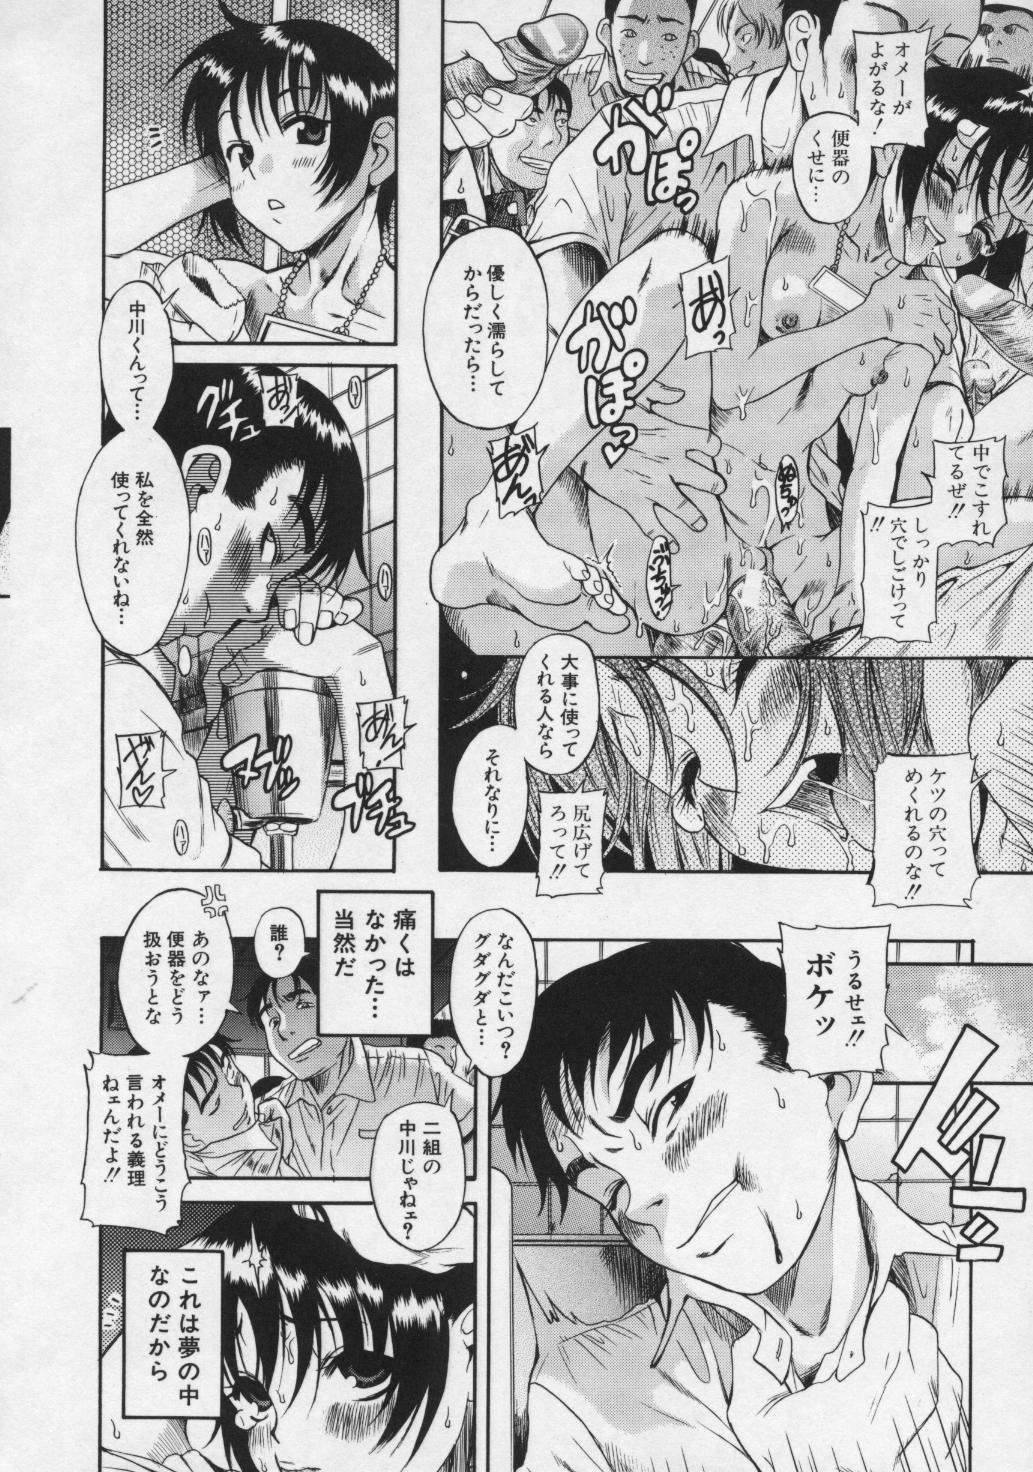 Kimi no Na o Yobeba - If I call your name. 53